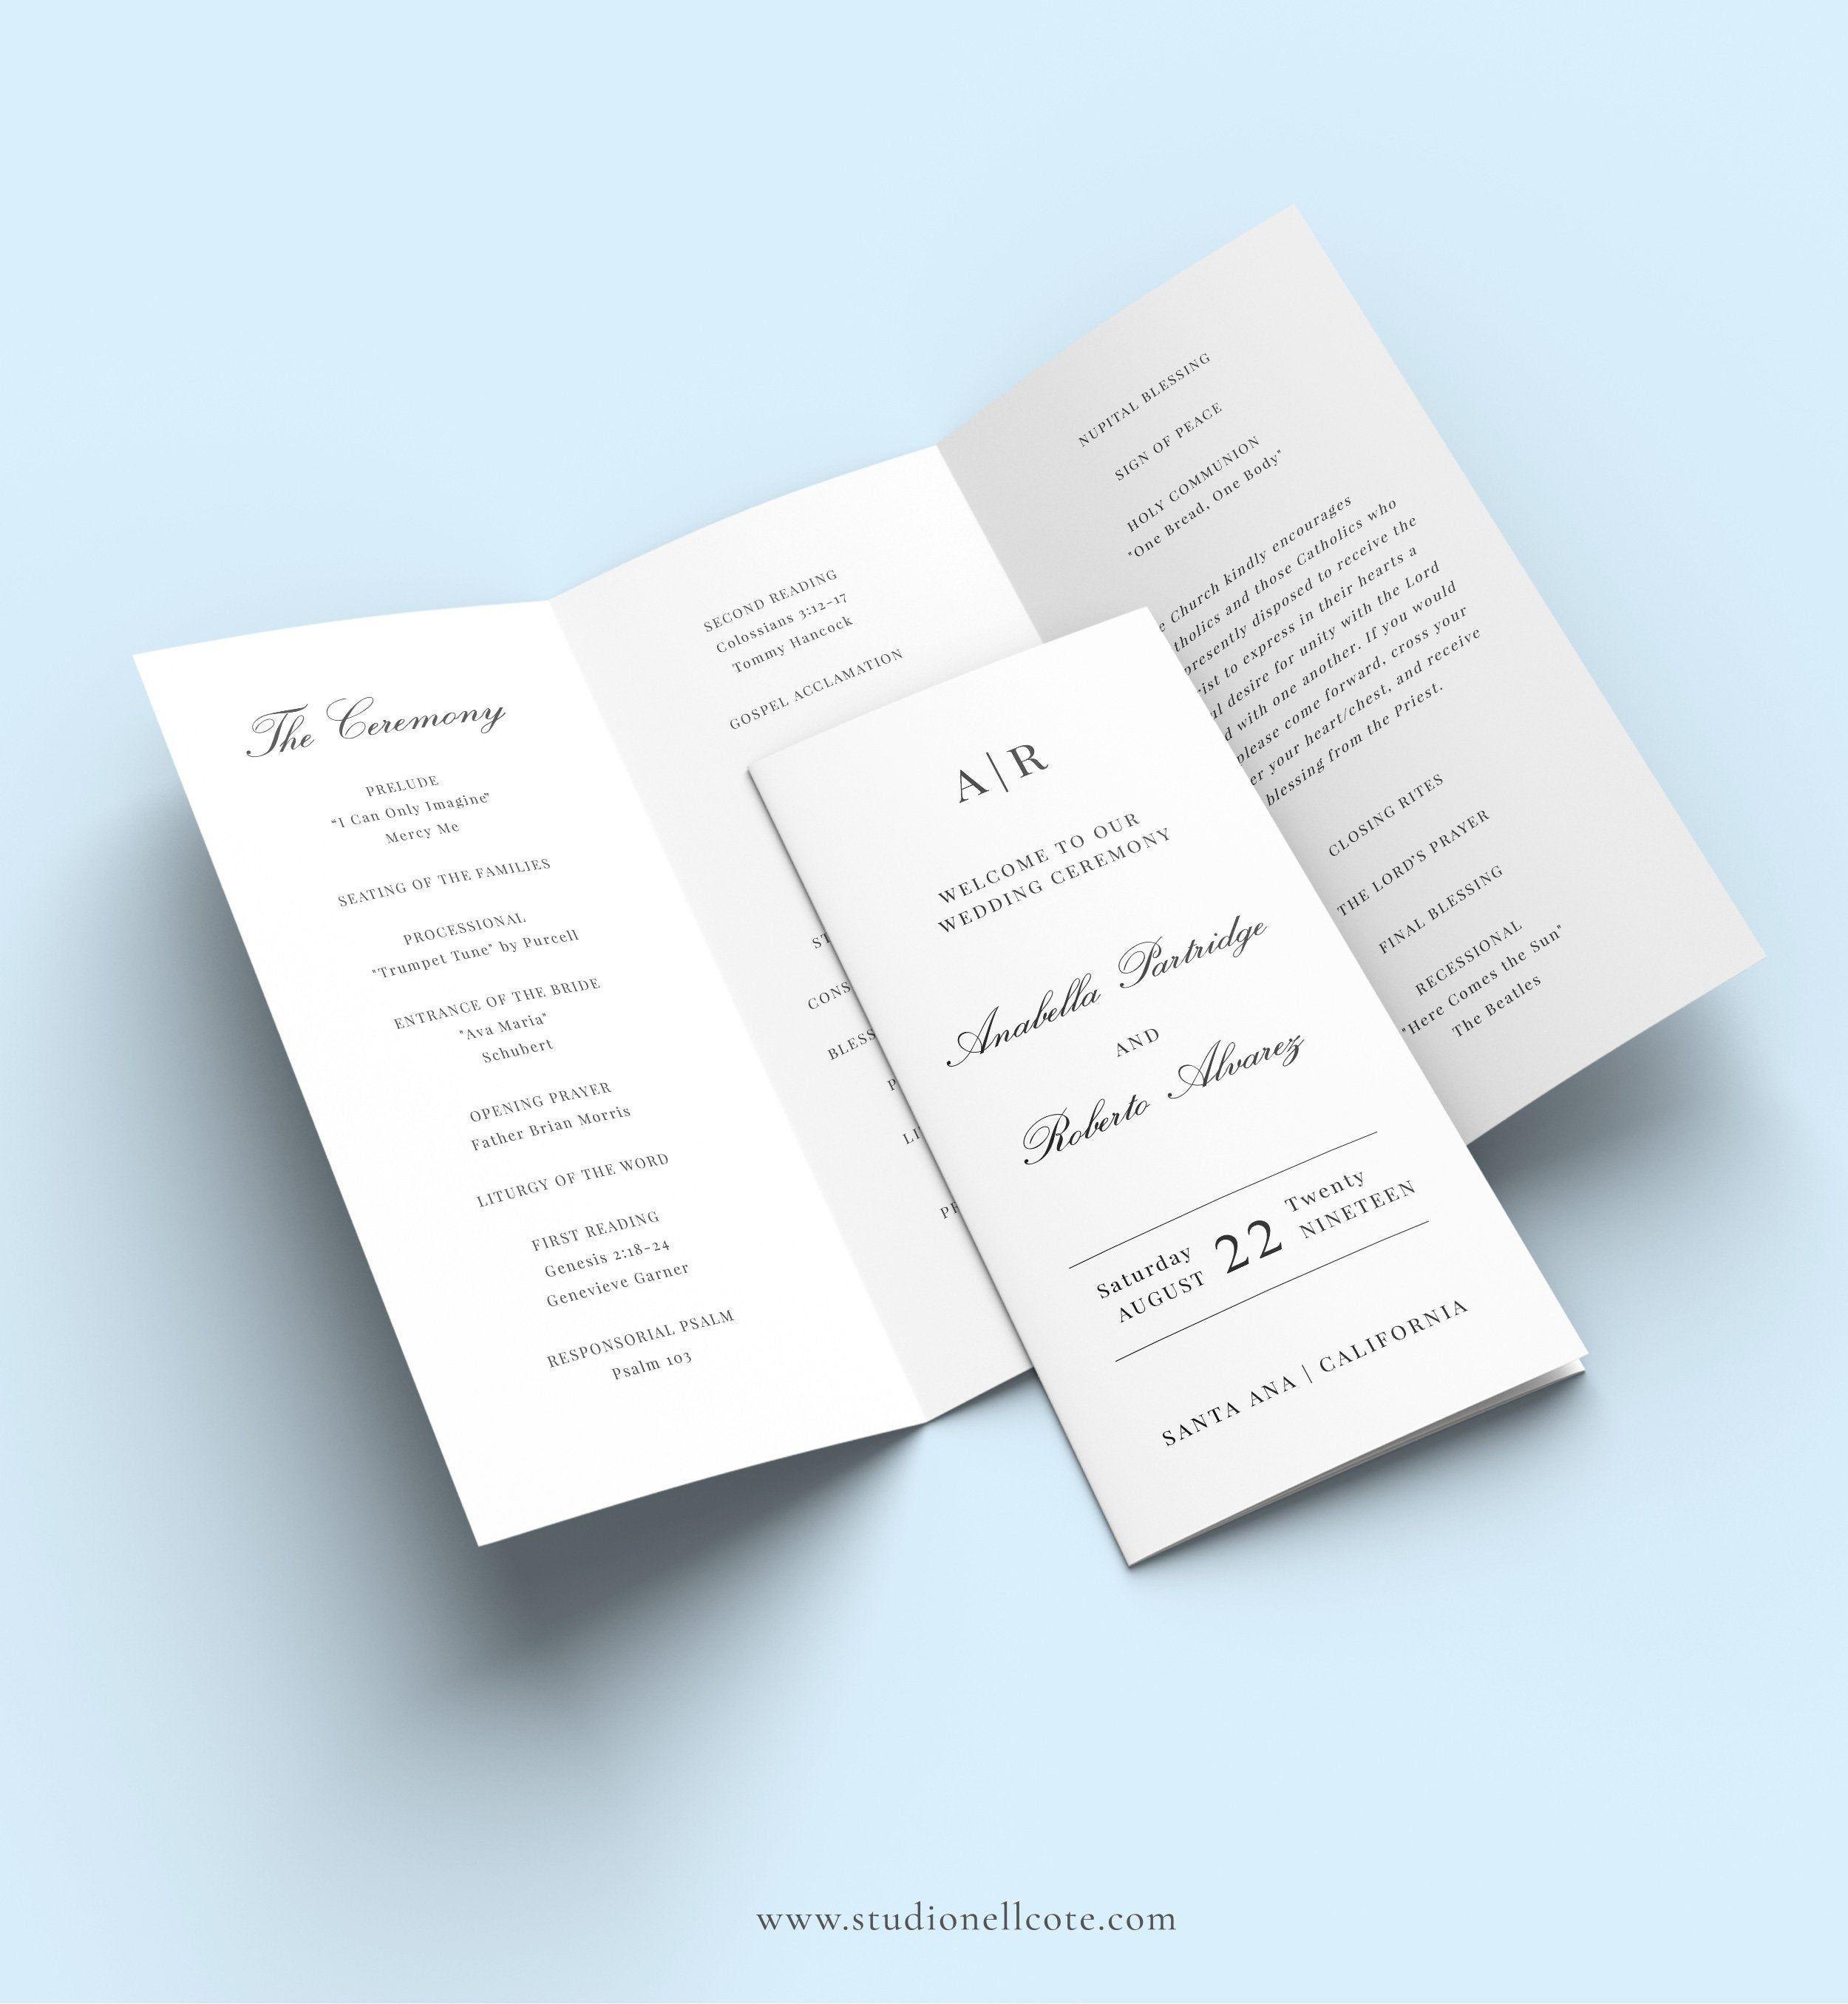 008 Awesome Trifold Wedding Program Template Design  Tri Fold Word Folded ExampleFull